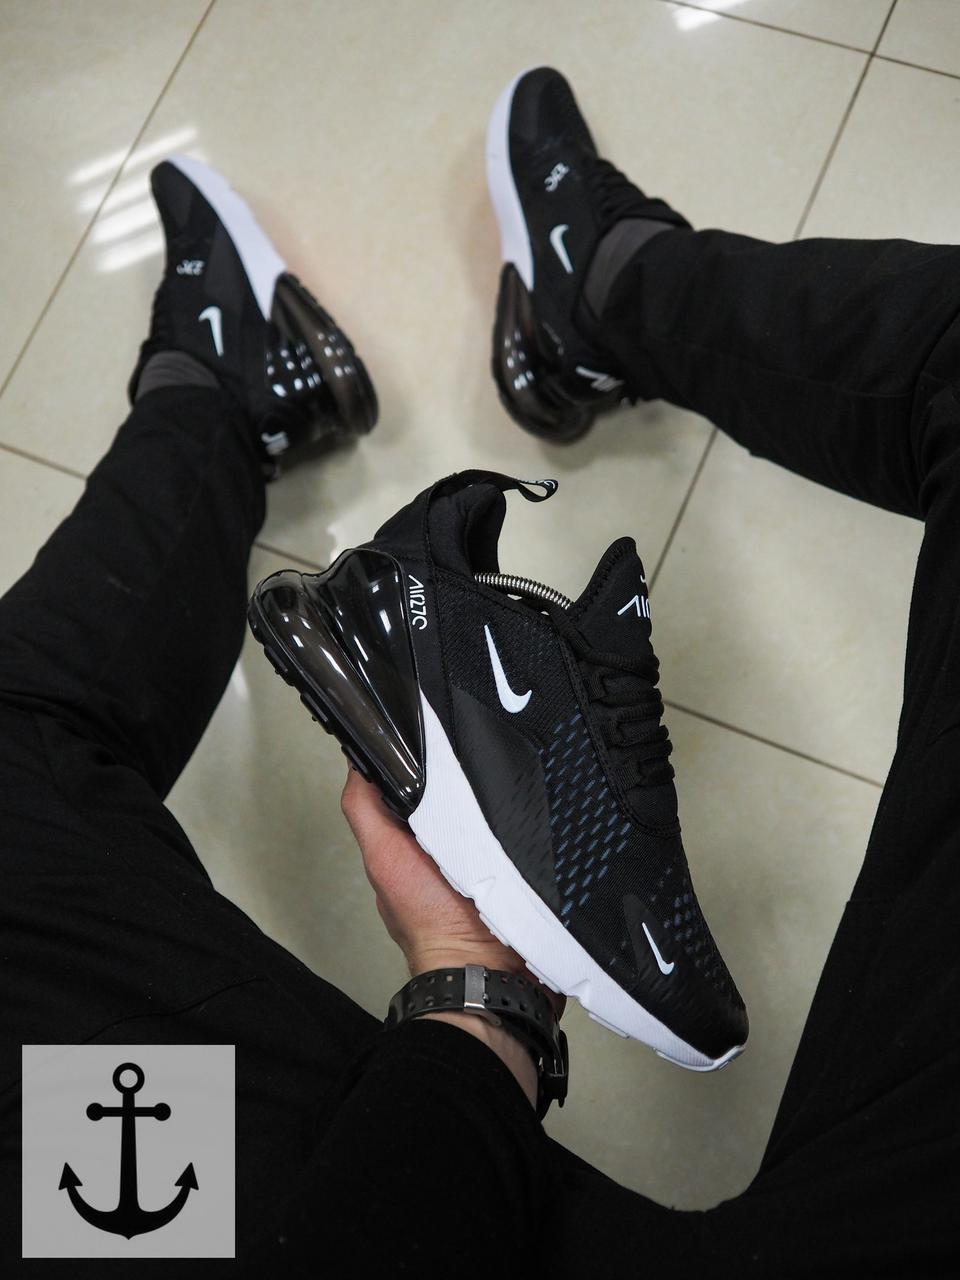 7d02dd1f Мужские кроссовки Nike Air Max 270 (ТОП РЕПЛИКА ААА+), цена 1 349,10 ...